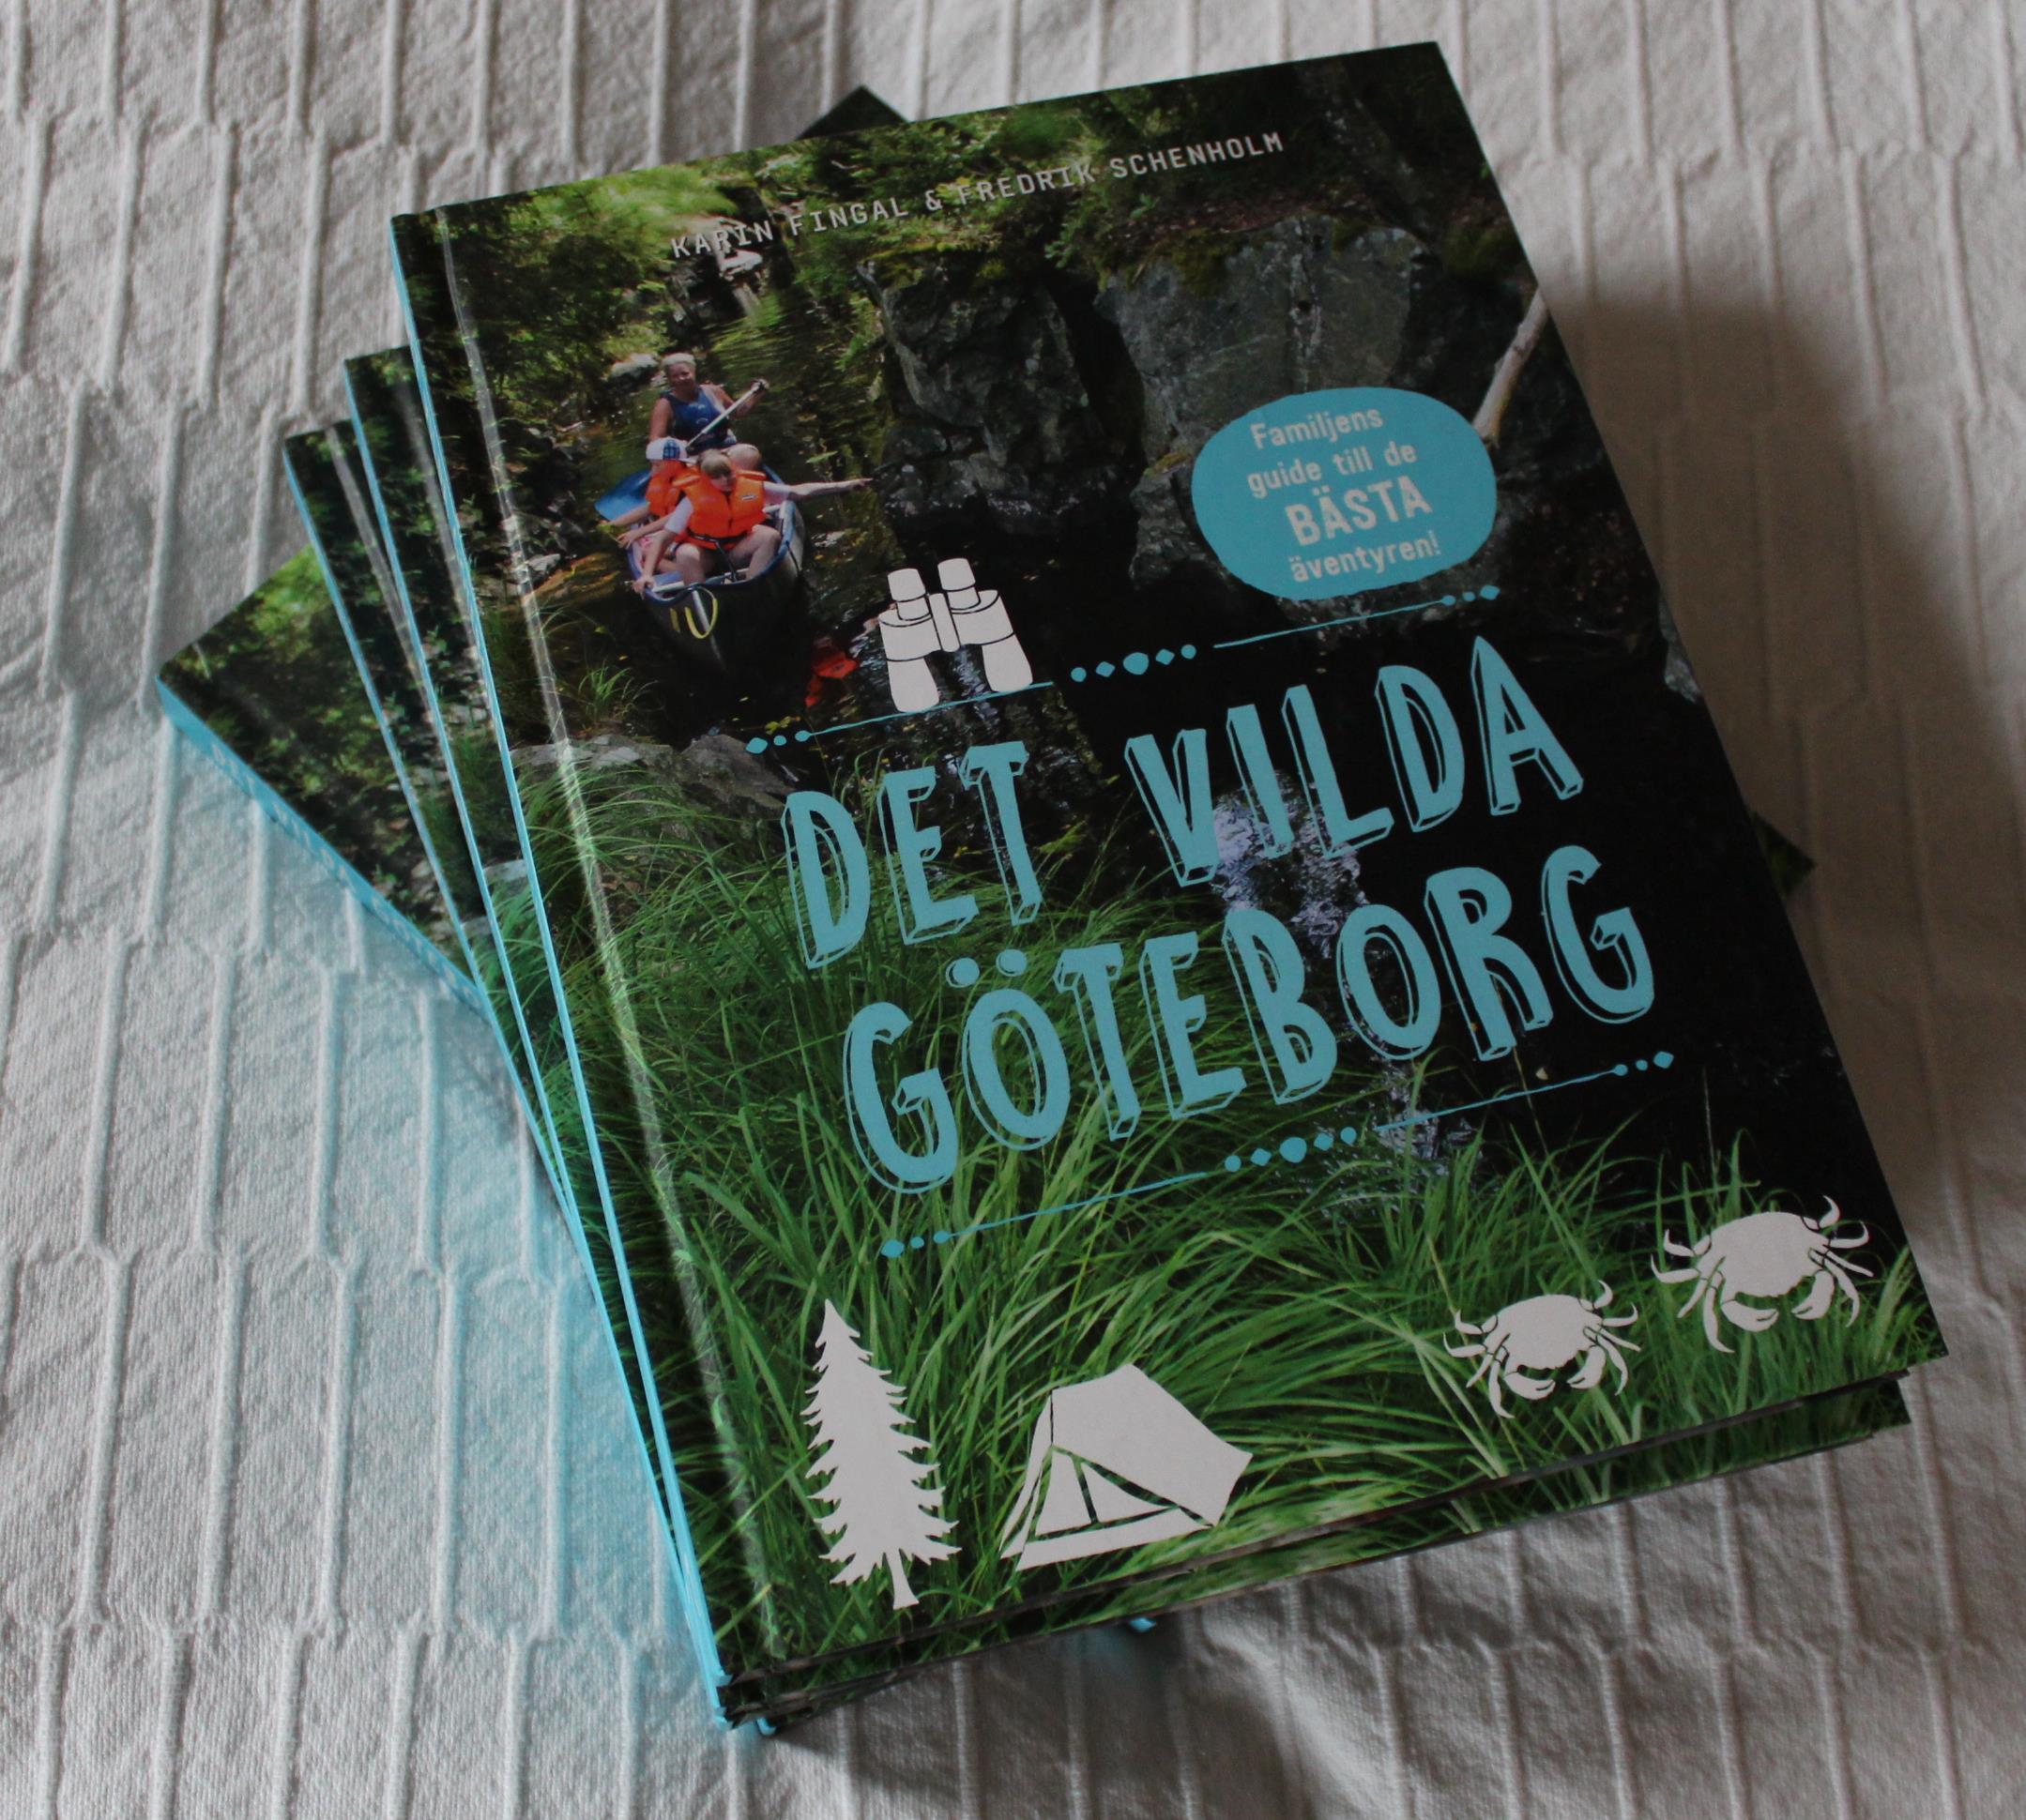 Ny Bok: Det vilda Göteborg